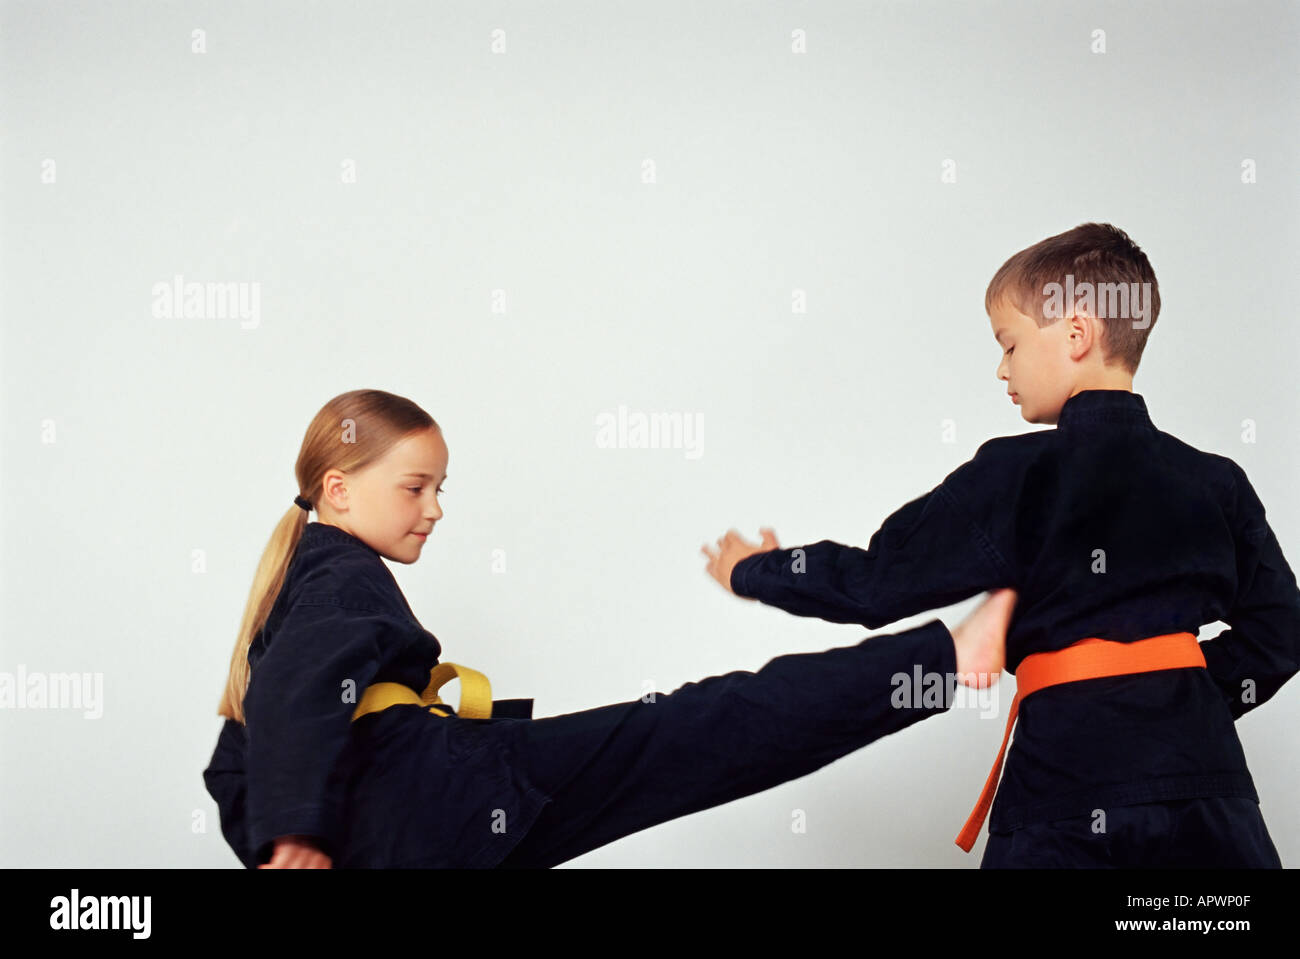 Martial Art Girl Stock Photos & Martial Art Girl Stock Images - Alamy